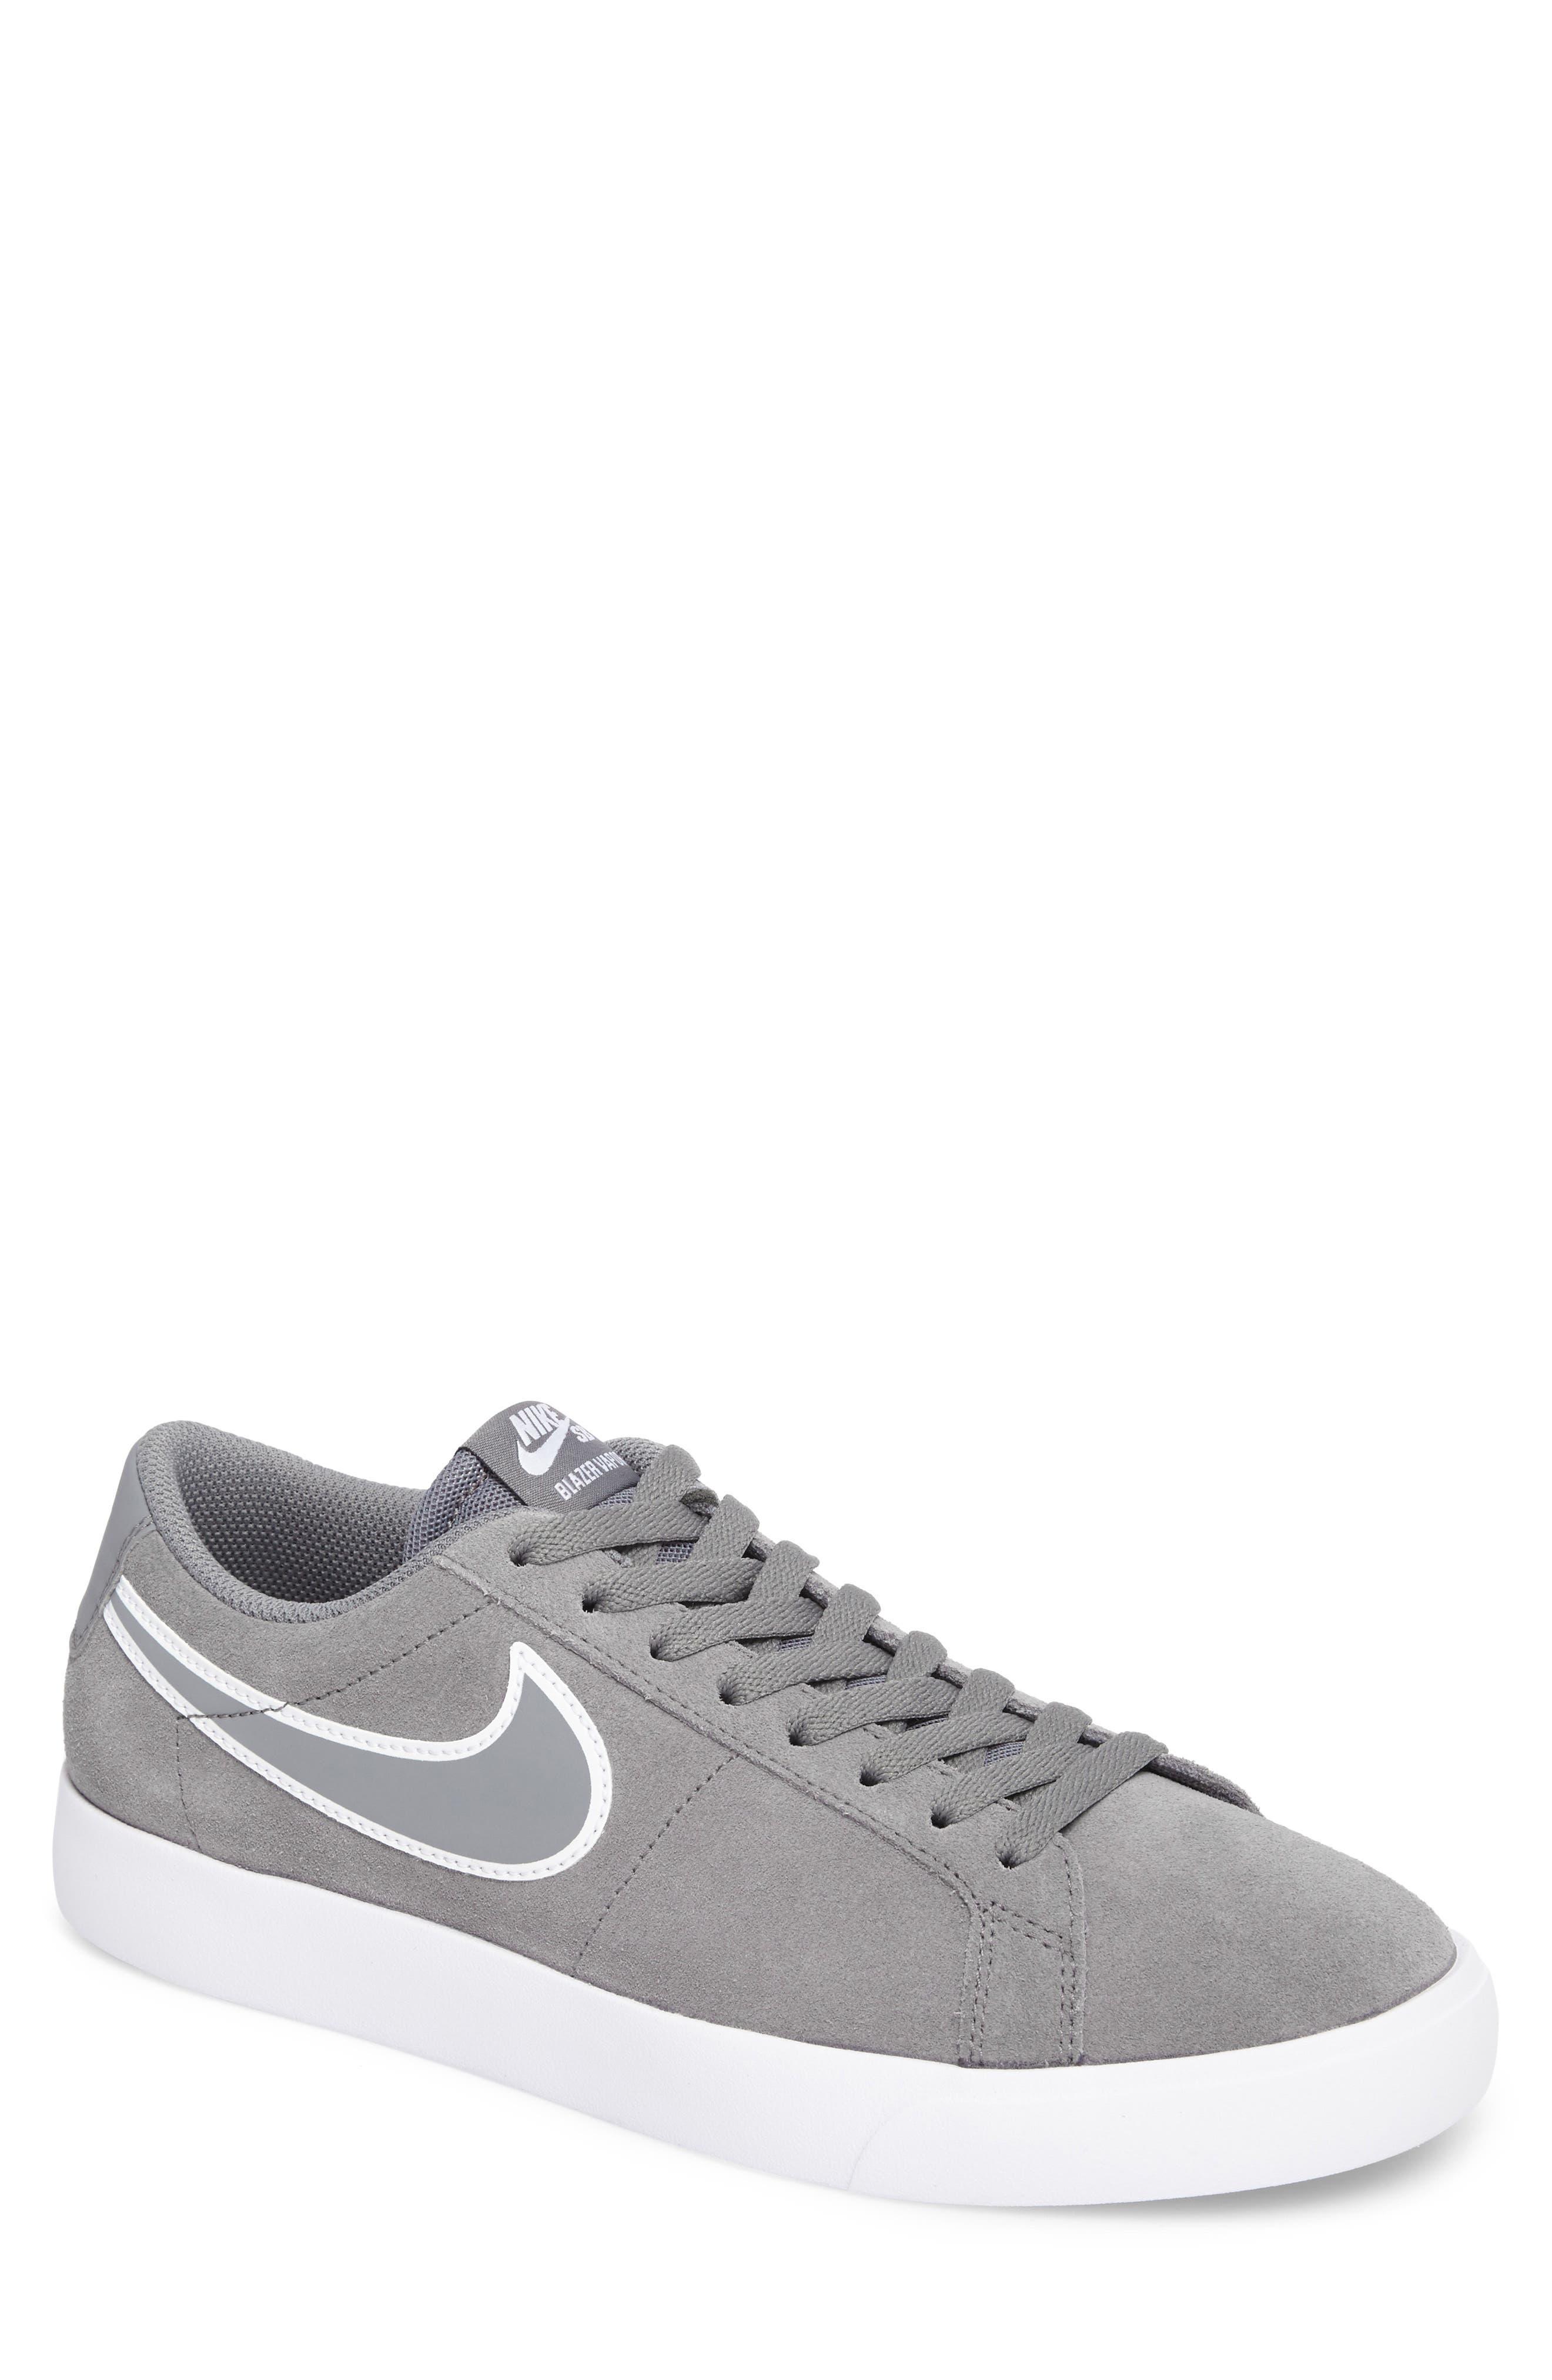 SB Blazer Vapor Skateboarding Sneaker,                         Main,                         color, Cool Grey/Cool Grey/White